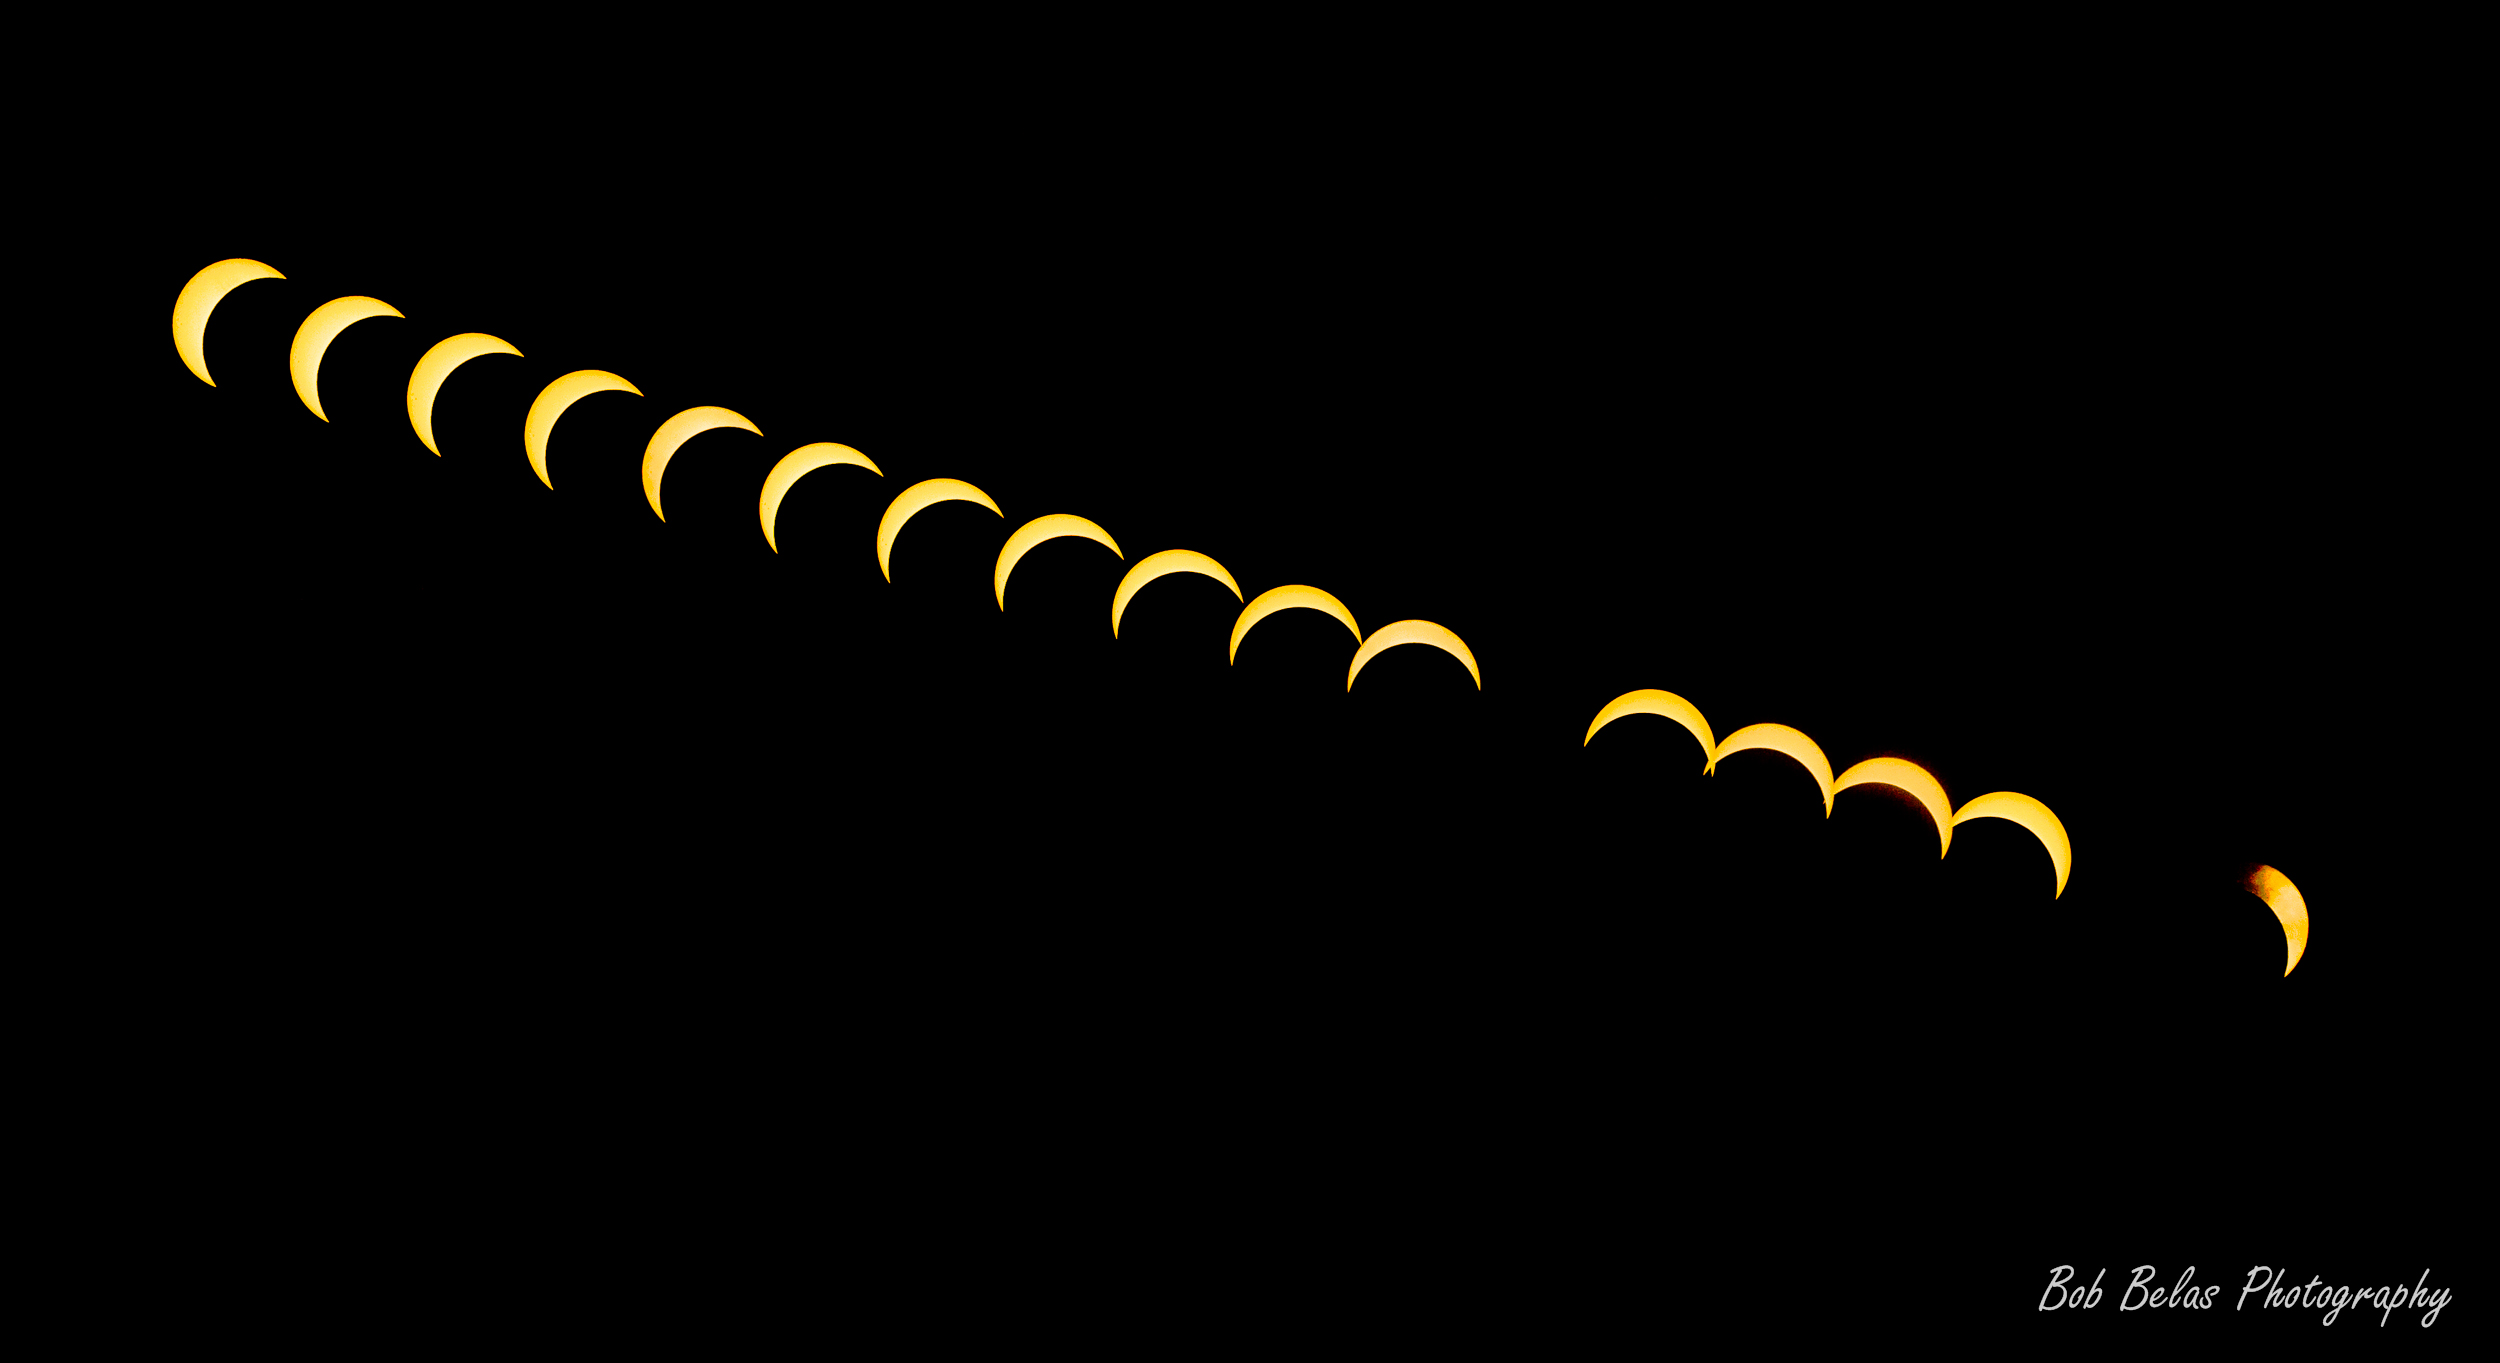 US Solar Eclipse of 2017, color timelapse composite